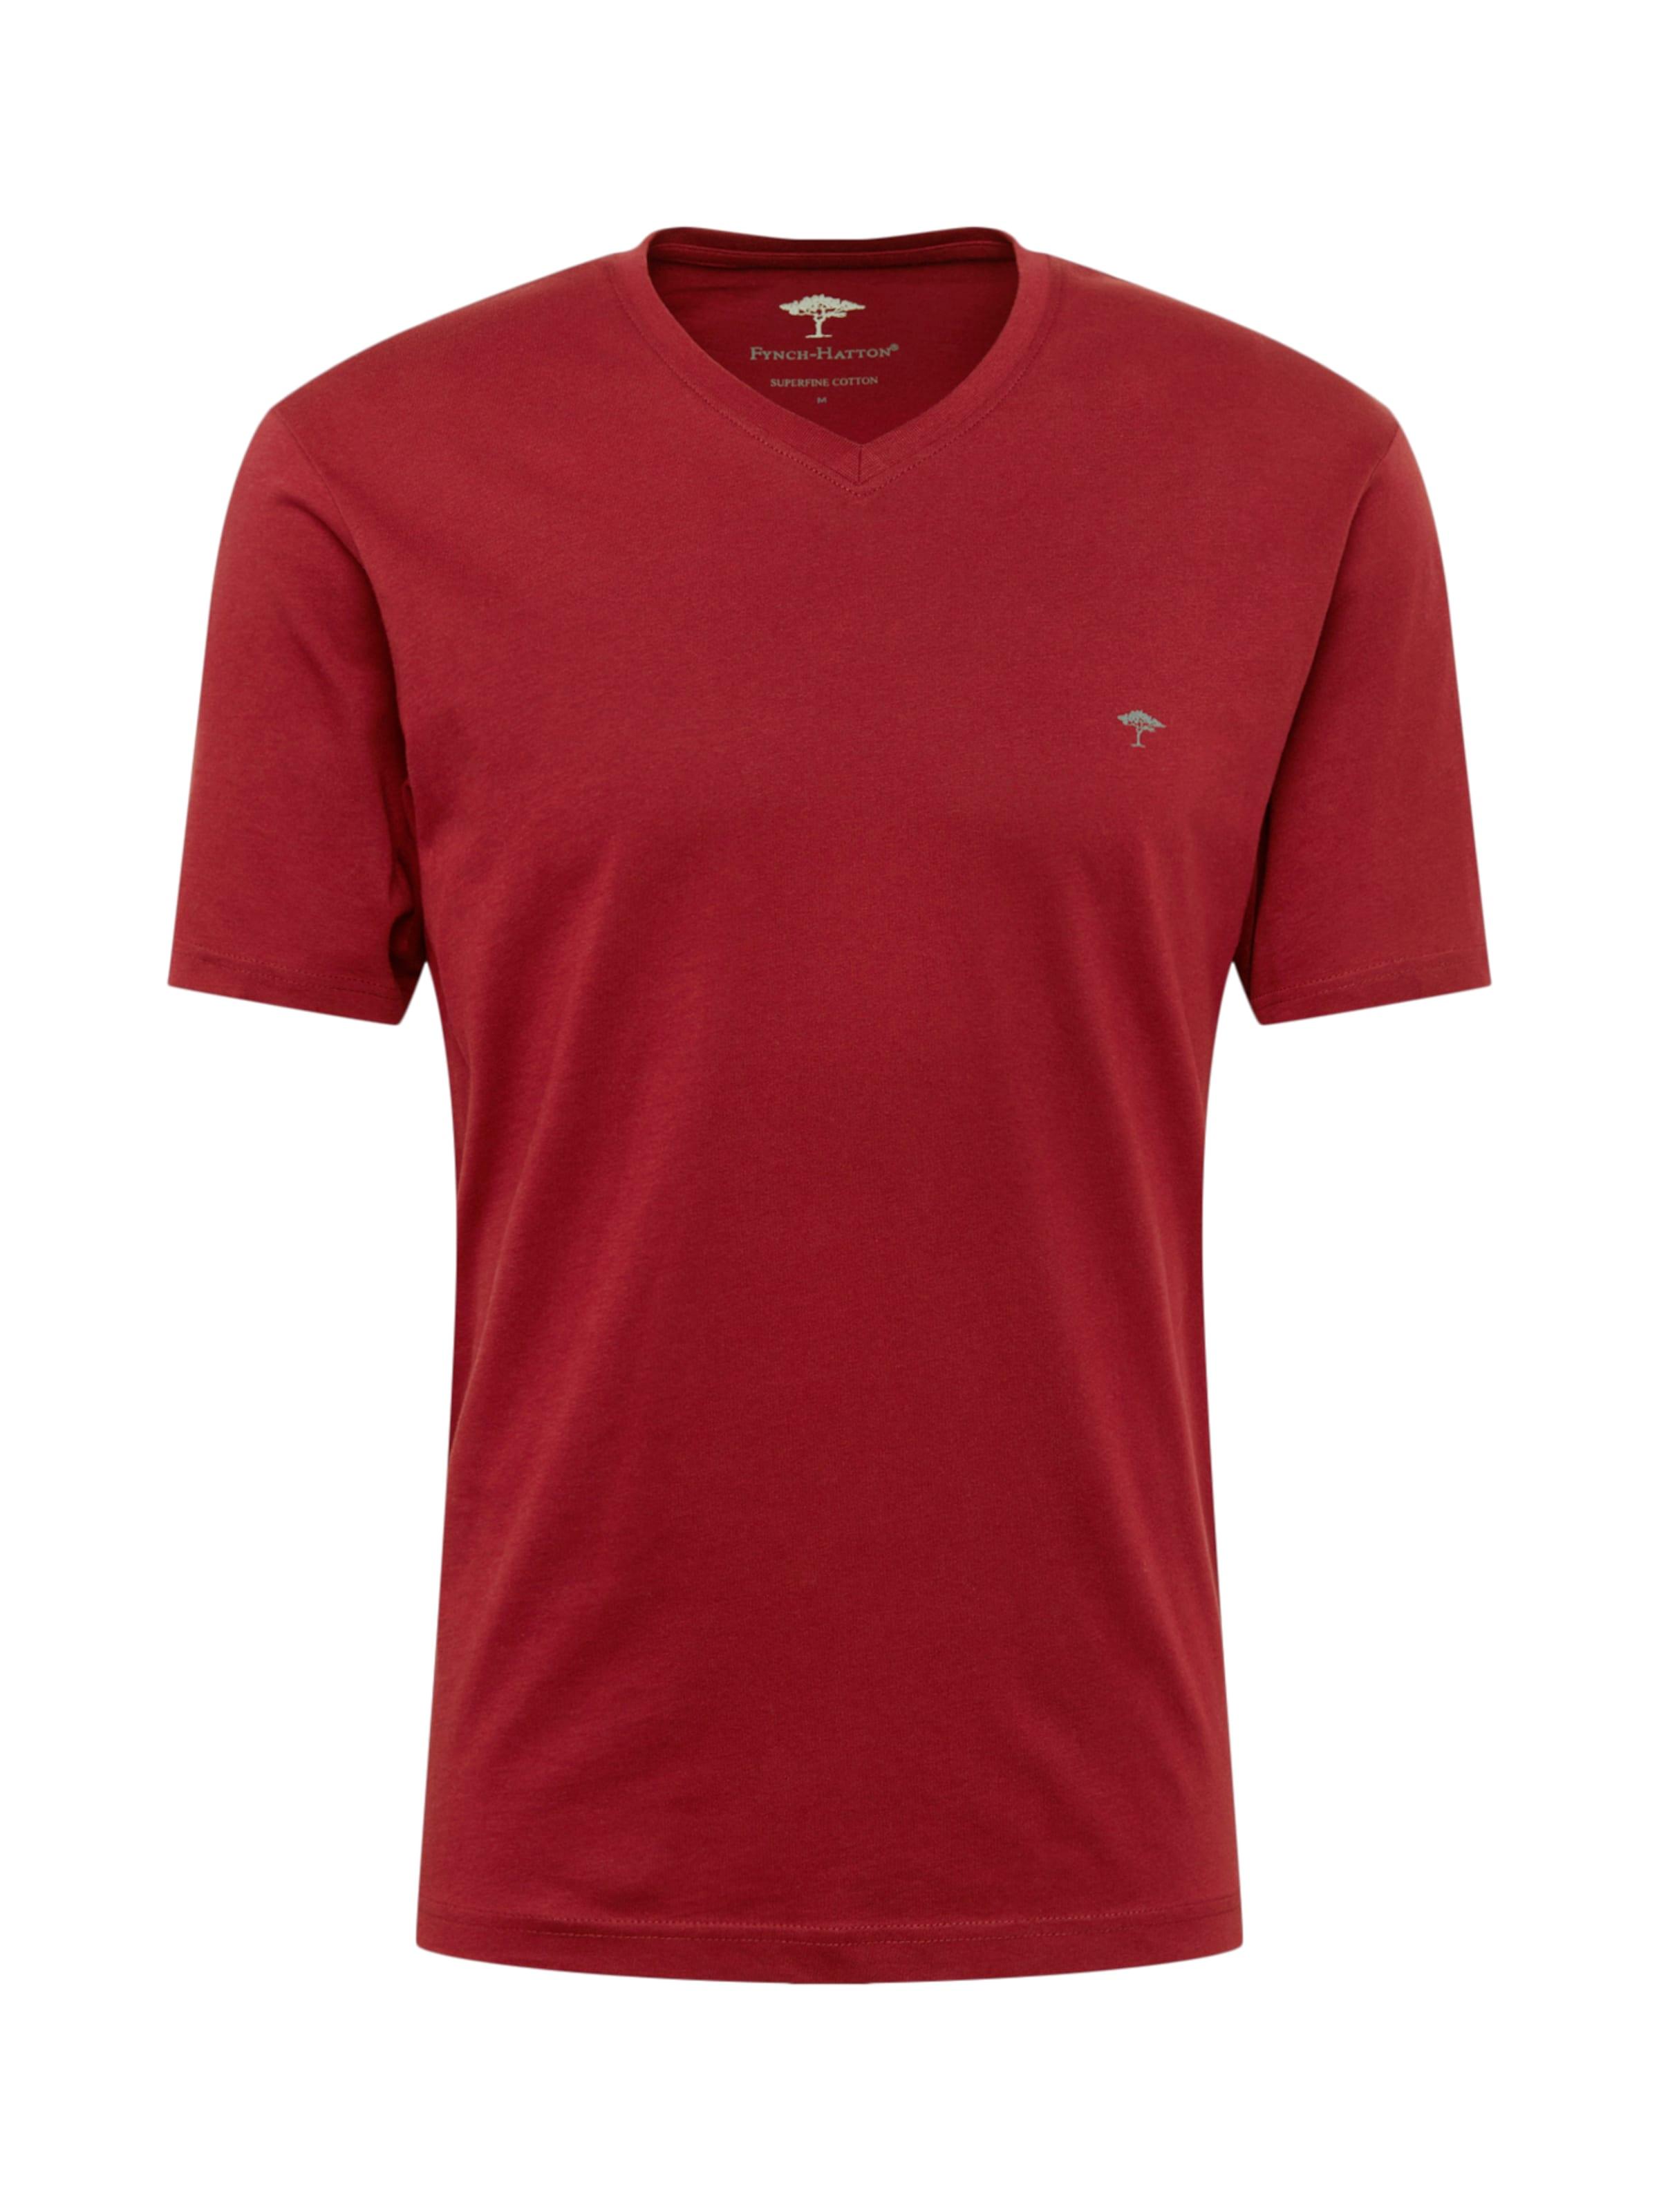 T En shirt hatton De Lie Fynch Vin bY6yIgf7v